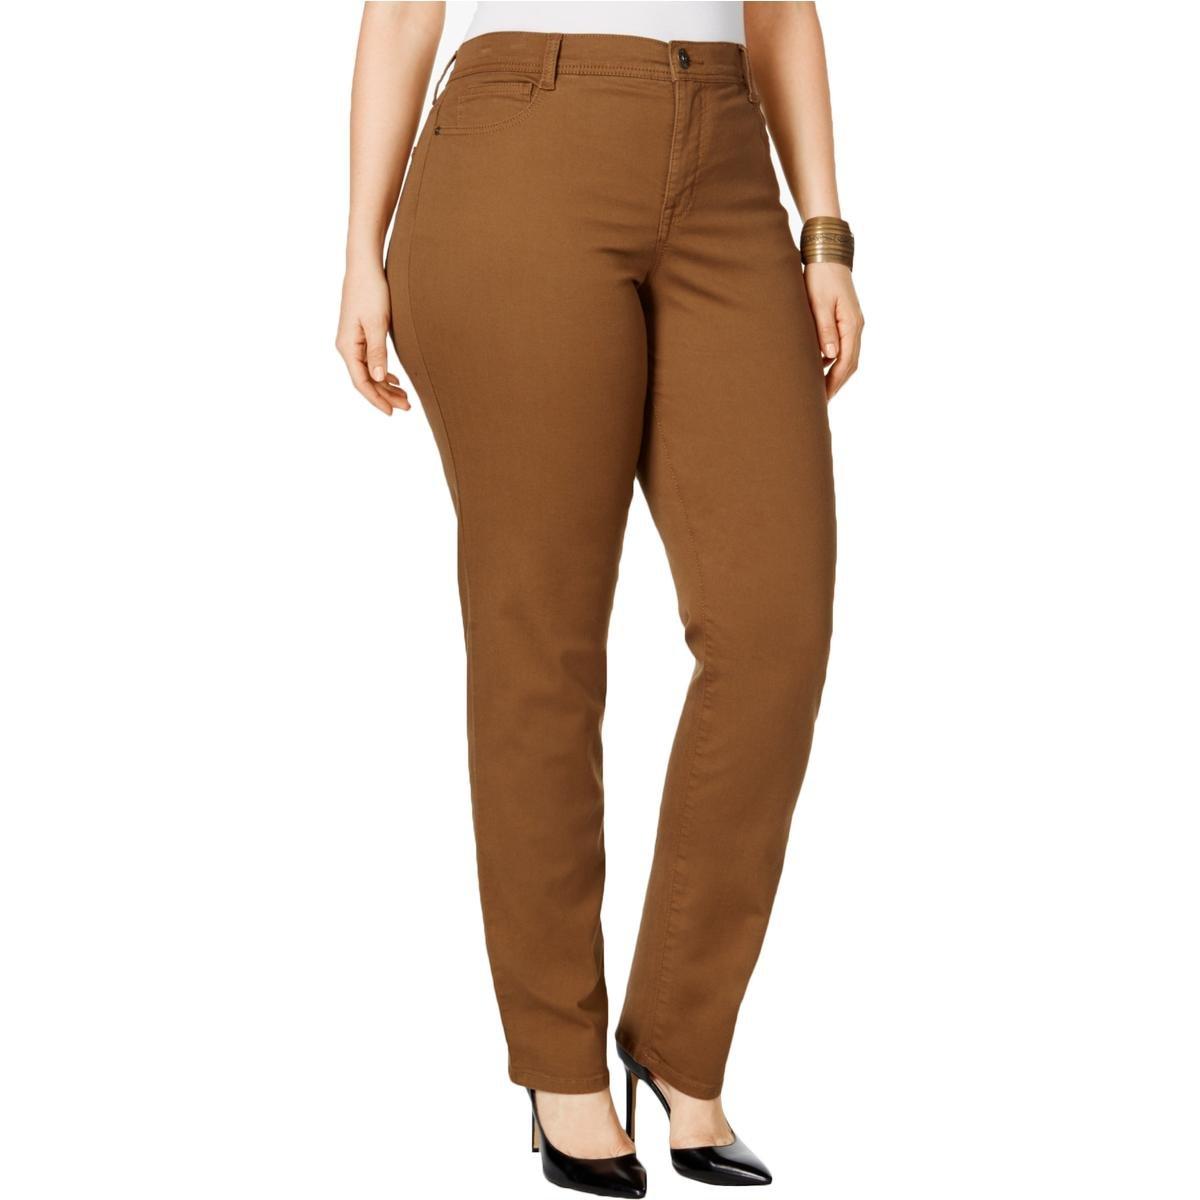 Style & Co. Womens Plus Tummy Slimming High Rise Slim Leg Jeans Brown 14W